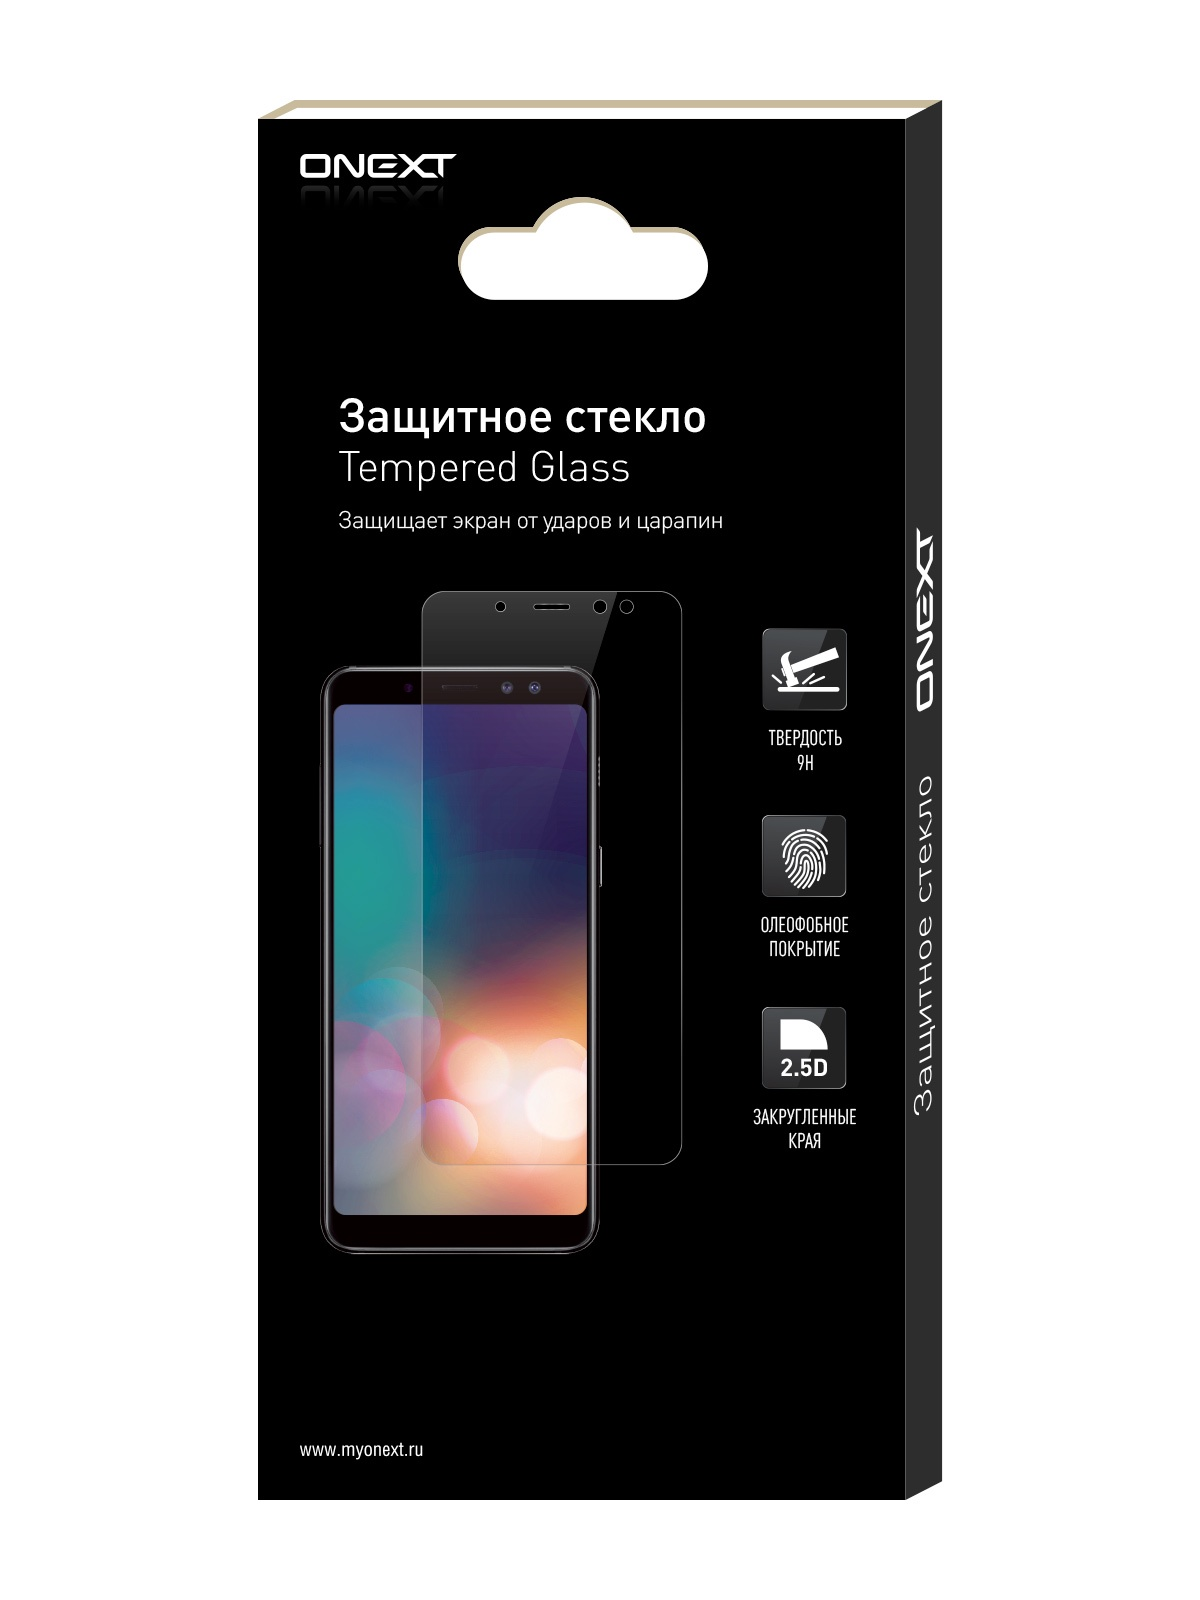 Защитное стекло ONEXT Huawei P9 Lite защитное стекло onext для huawei p10 lite 641 41432 с рамкой белый